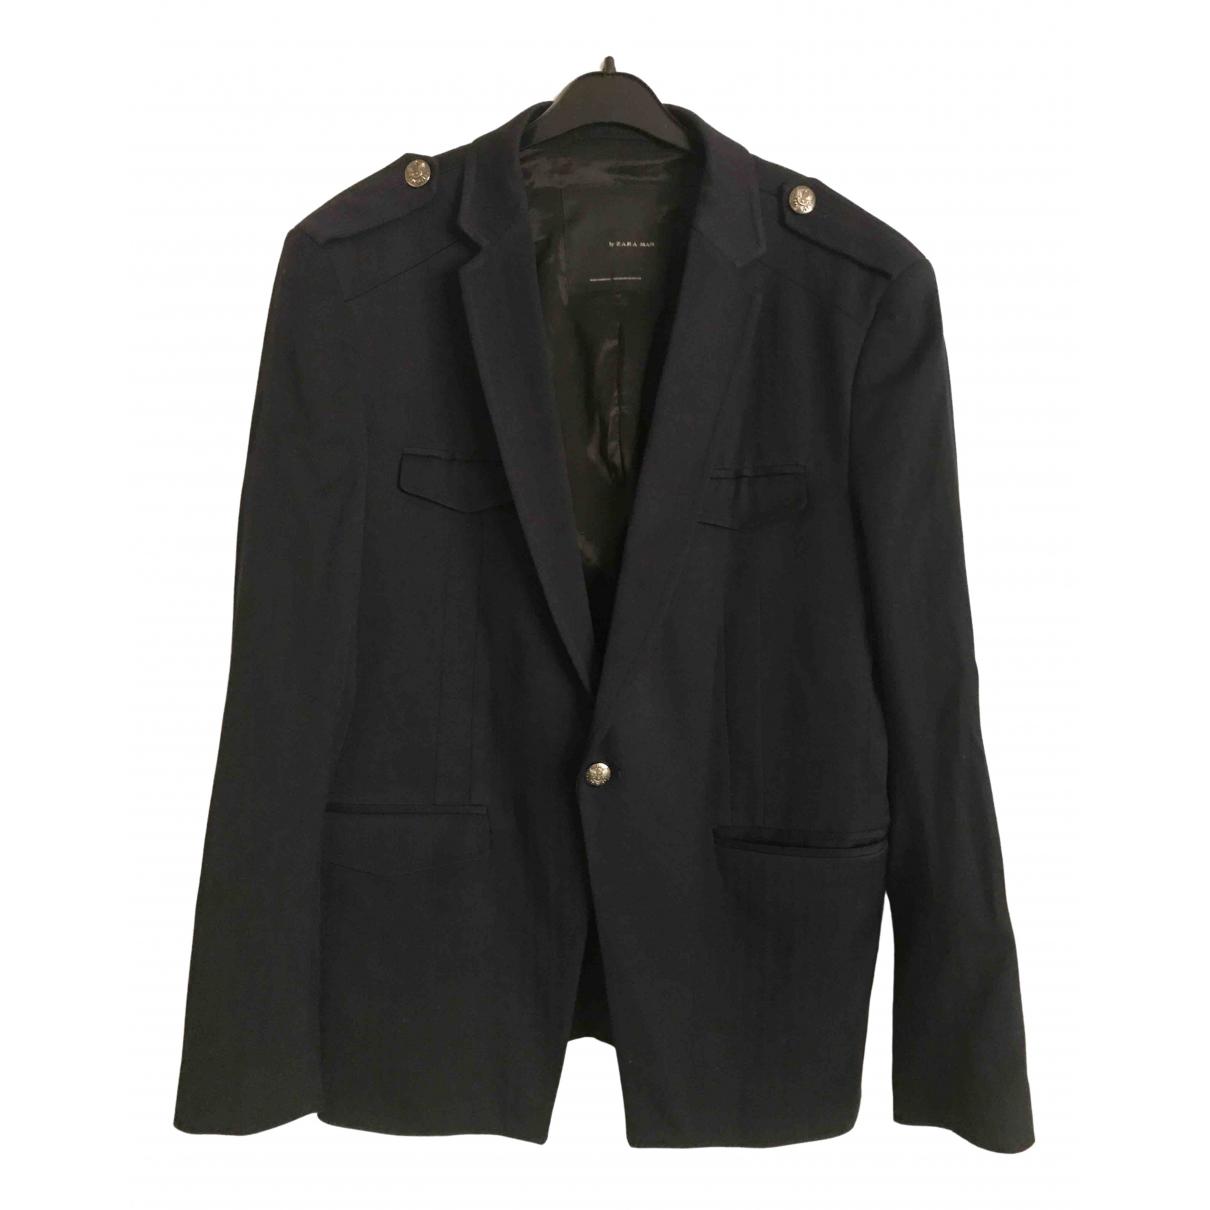 Zara \N Navy jacket  for Men 52 FR